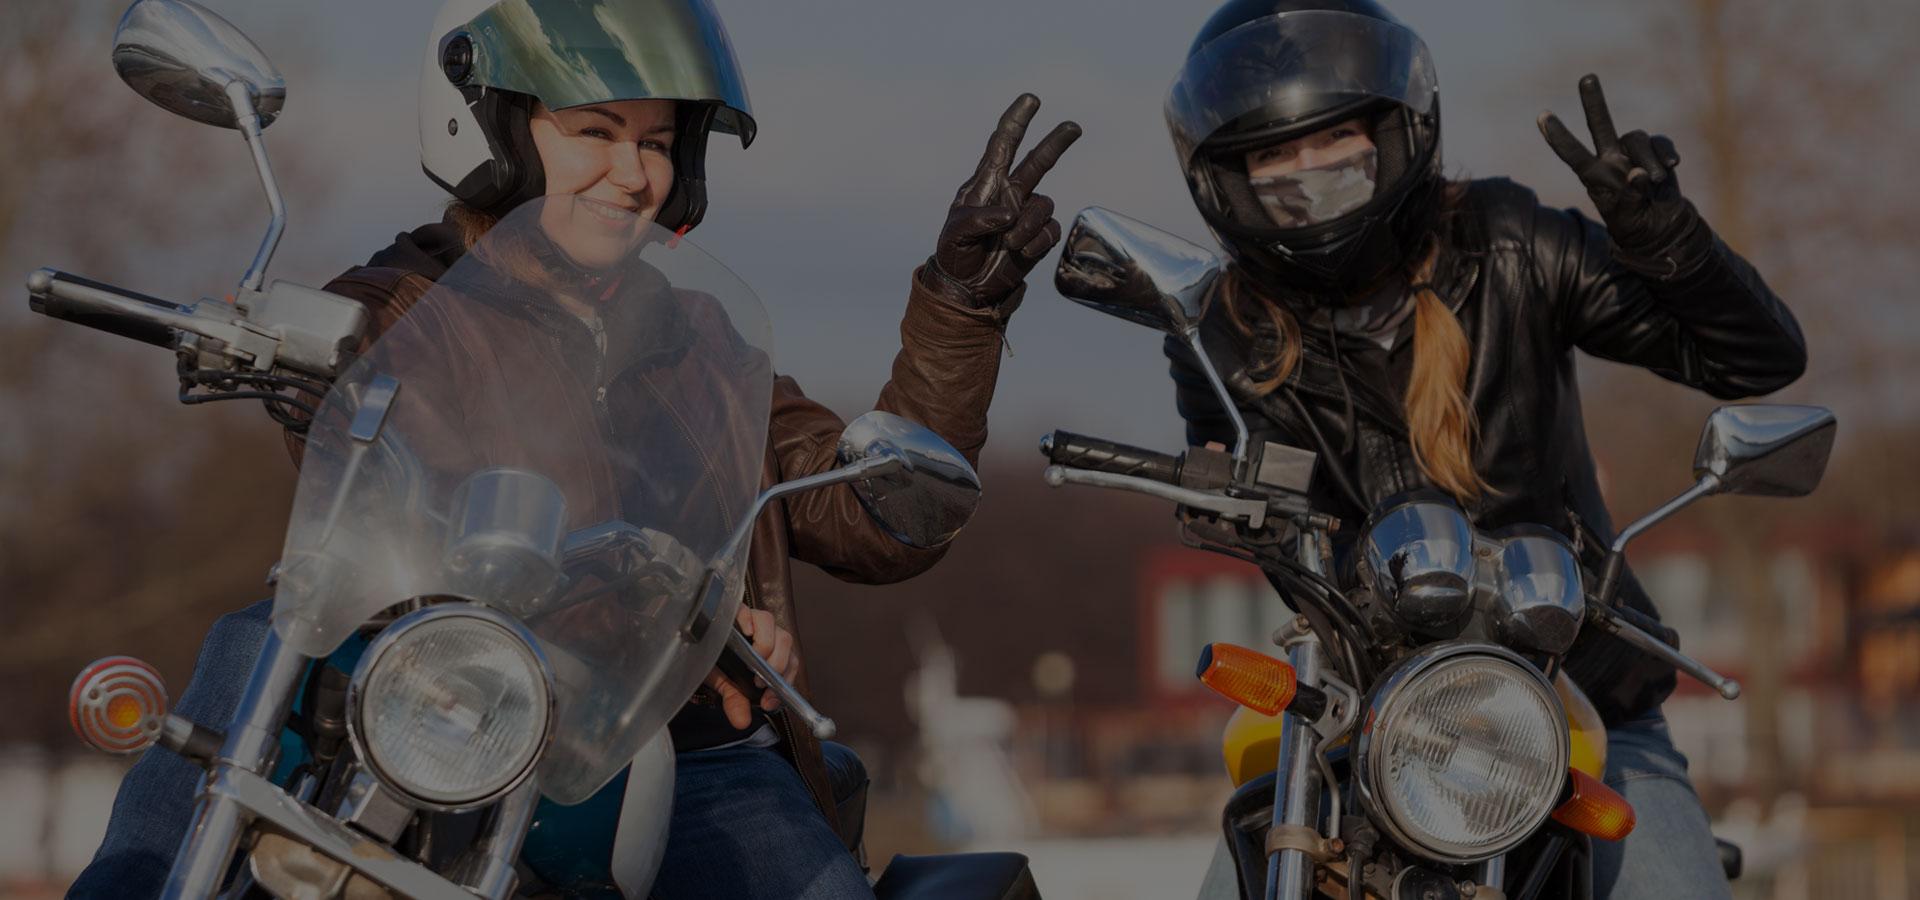 Langage-des-signes-entre-motards